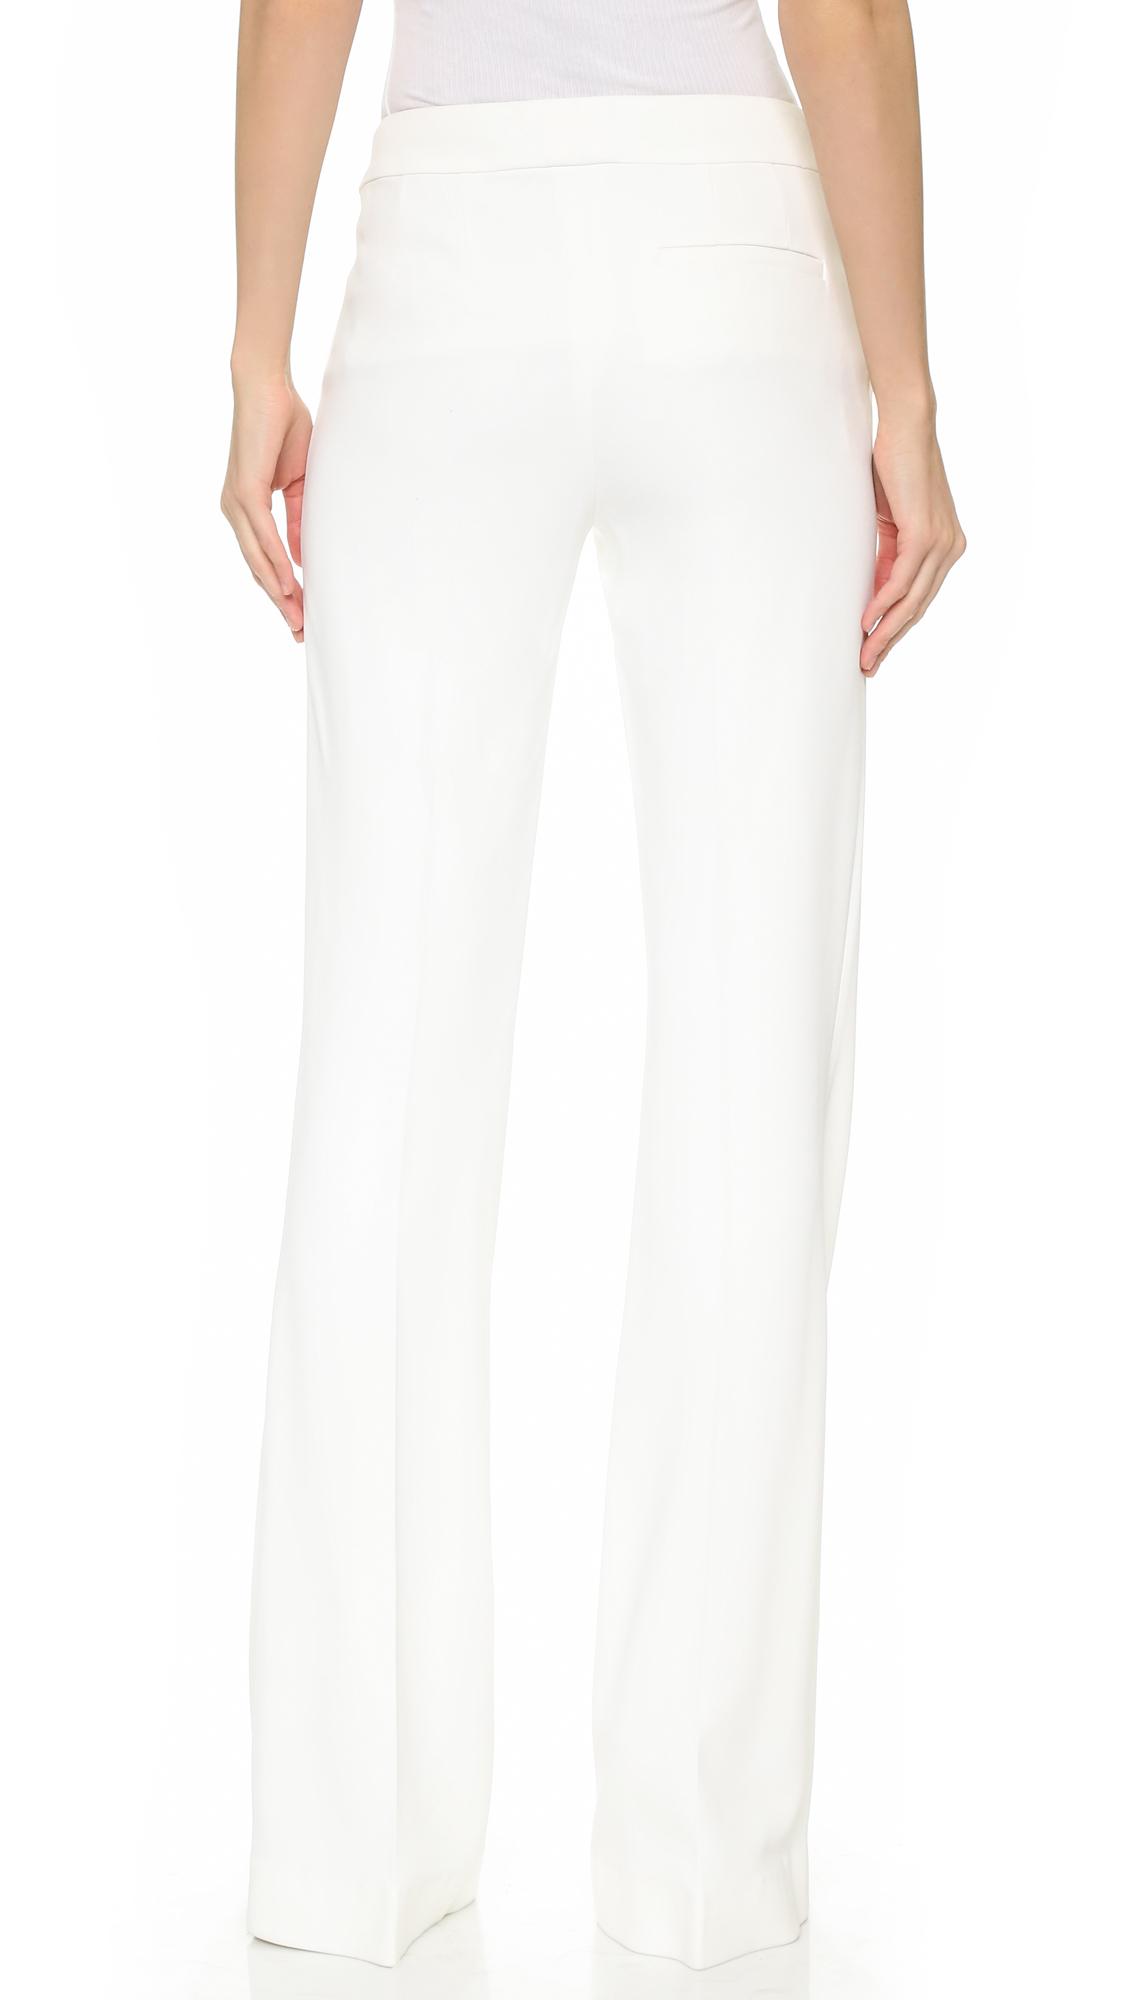 Giamba Wide Leg Pants - Ivory in White | Lyst